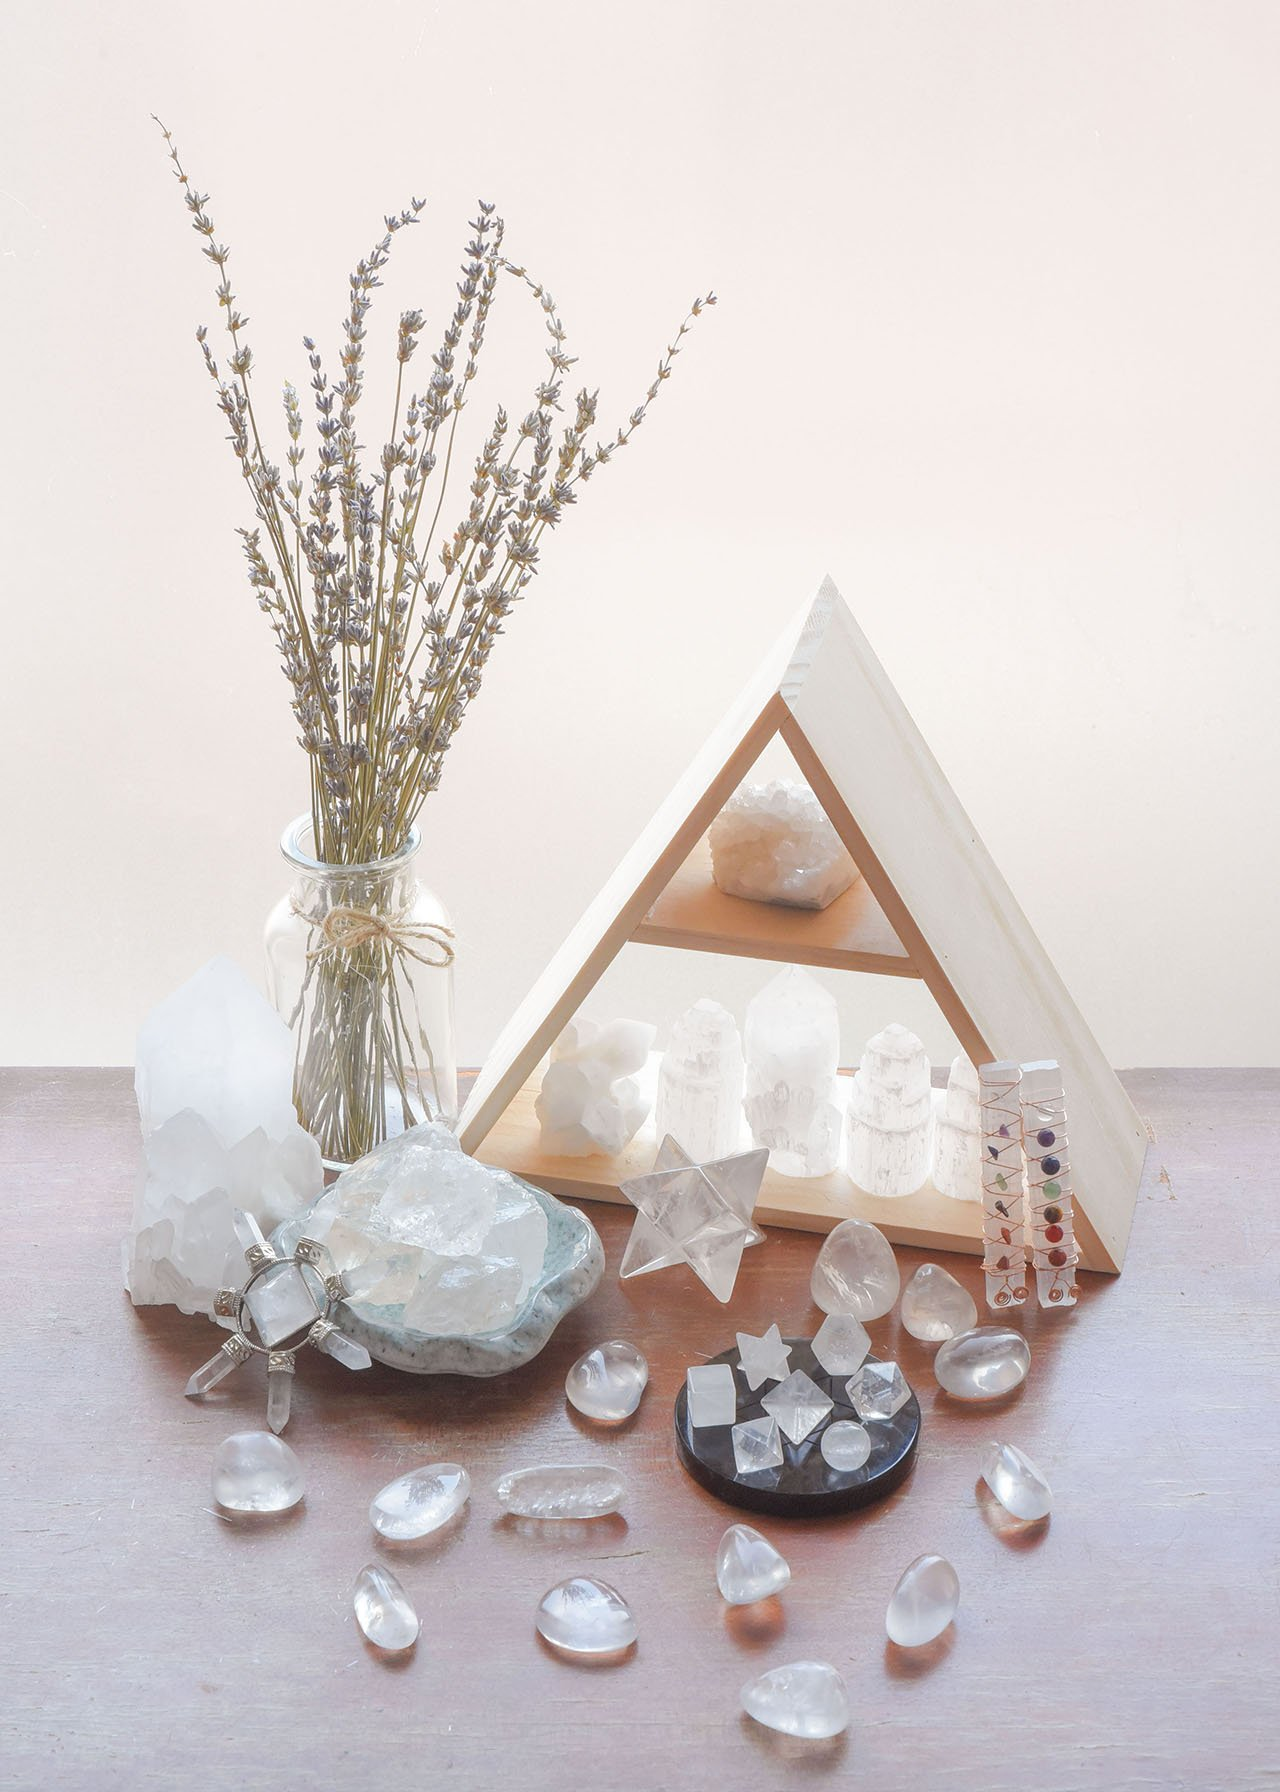 MANIFO 7pcs Quartz Crystal Platonic Solids Sacred Geometry Set Nautral Gemstones Kit with Merkaba StarFor Chakra Reiki Healing Energy,Yoga Meditation,Wicca,Therapy(Clear Quartz)